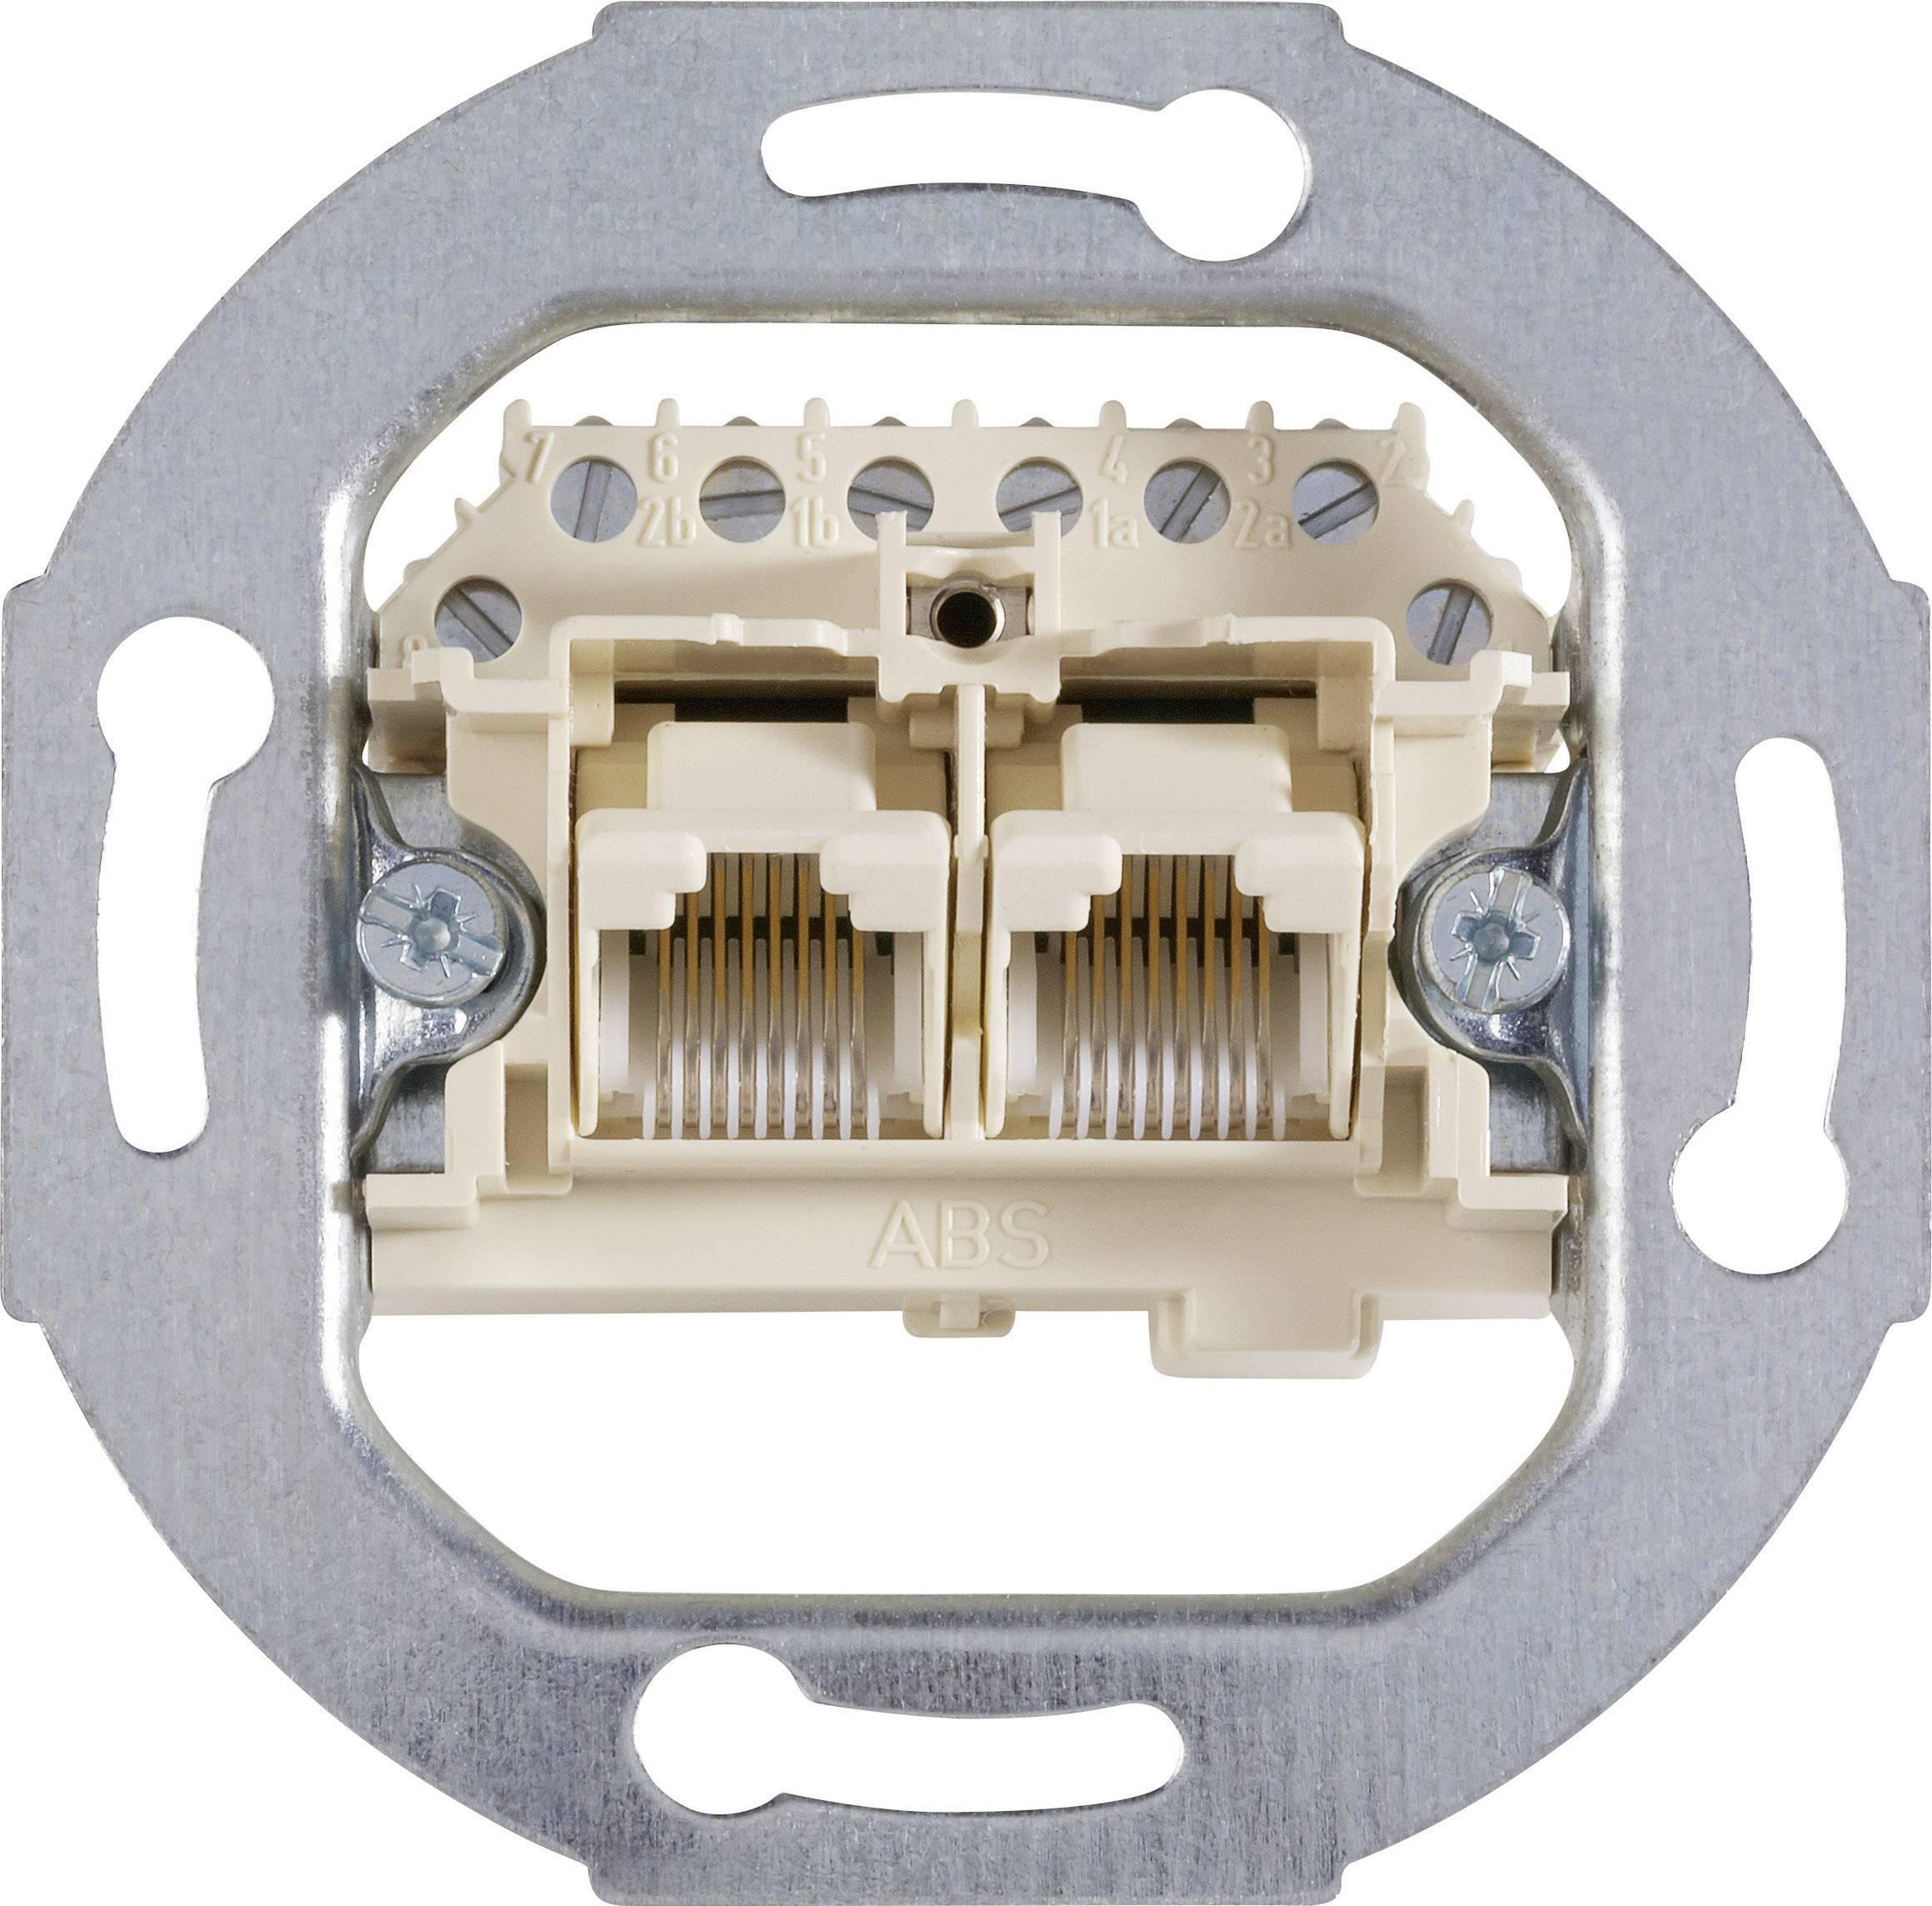 Vložka na UAE/IAE/ISDN zásuvky Busch-Jaeger 0214